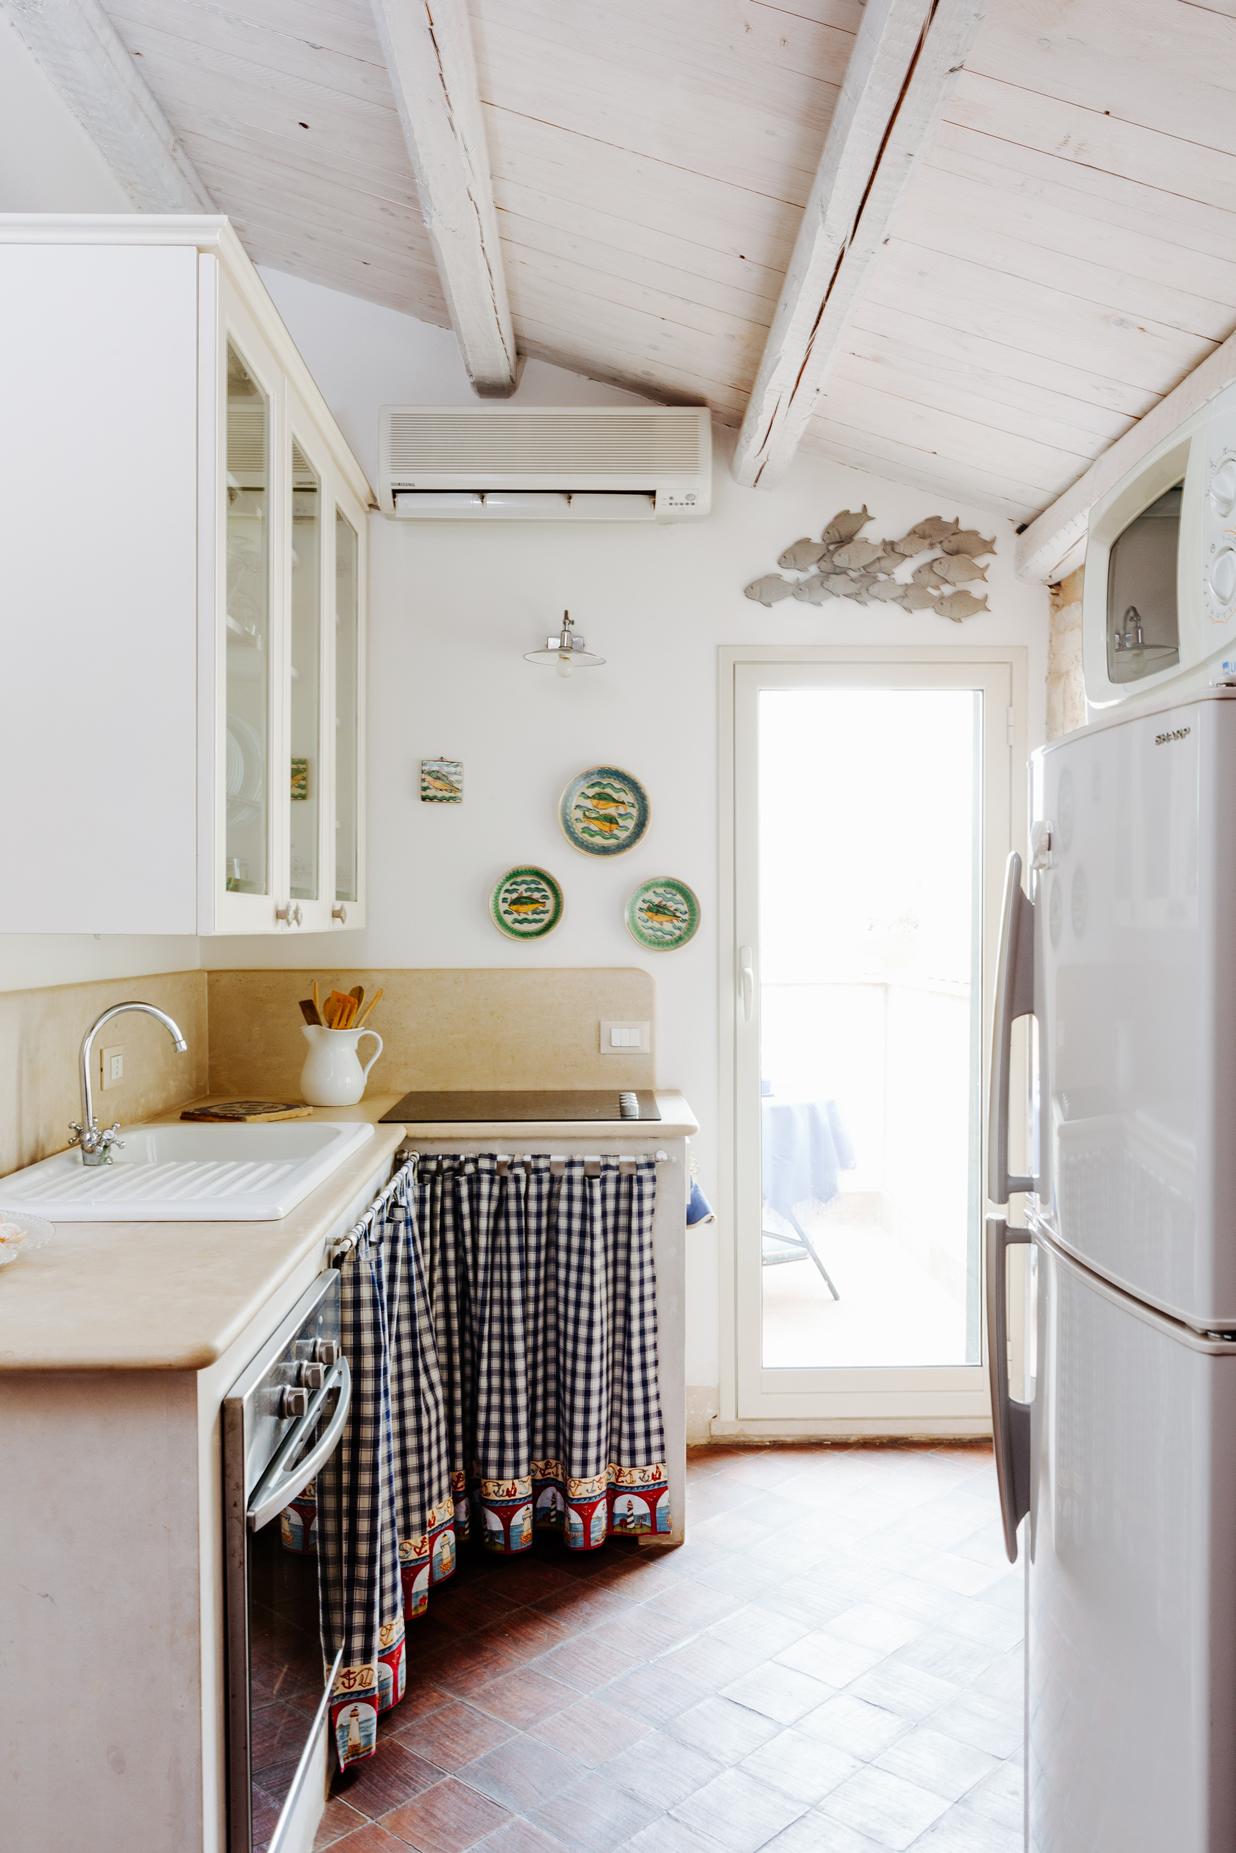 18sampieri-casa-vacanze-sicilia-appartamento-sicily-holiday-apartment-casa-di-pietra-italia-italy.jpg